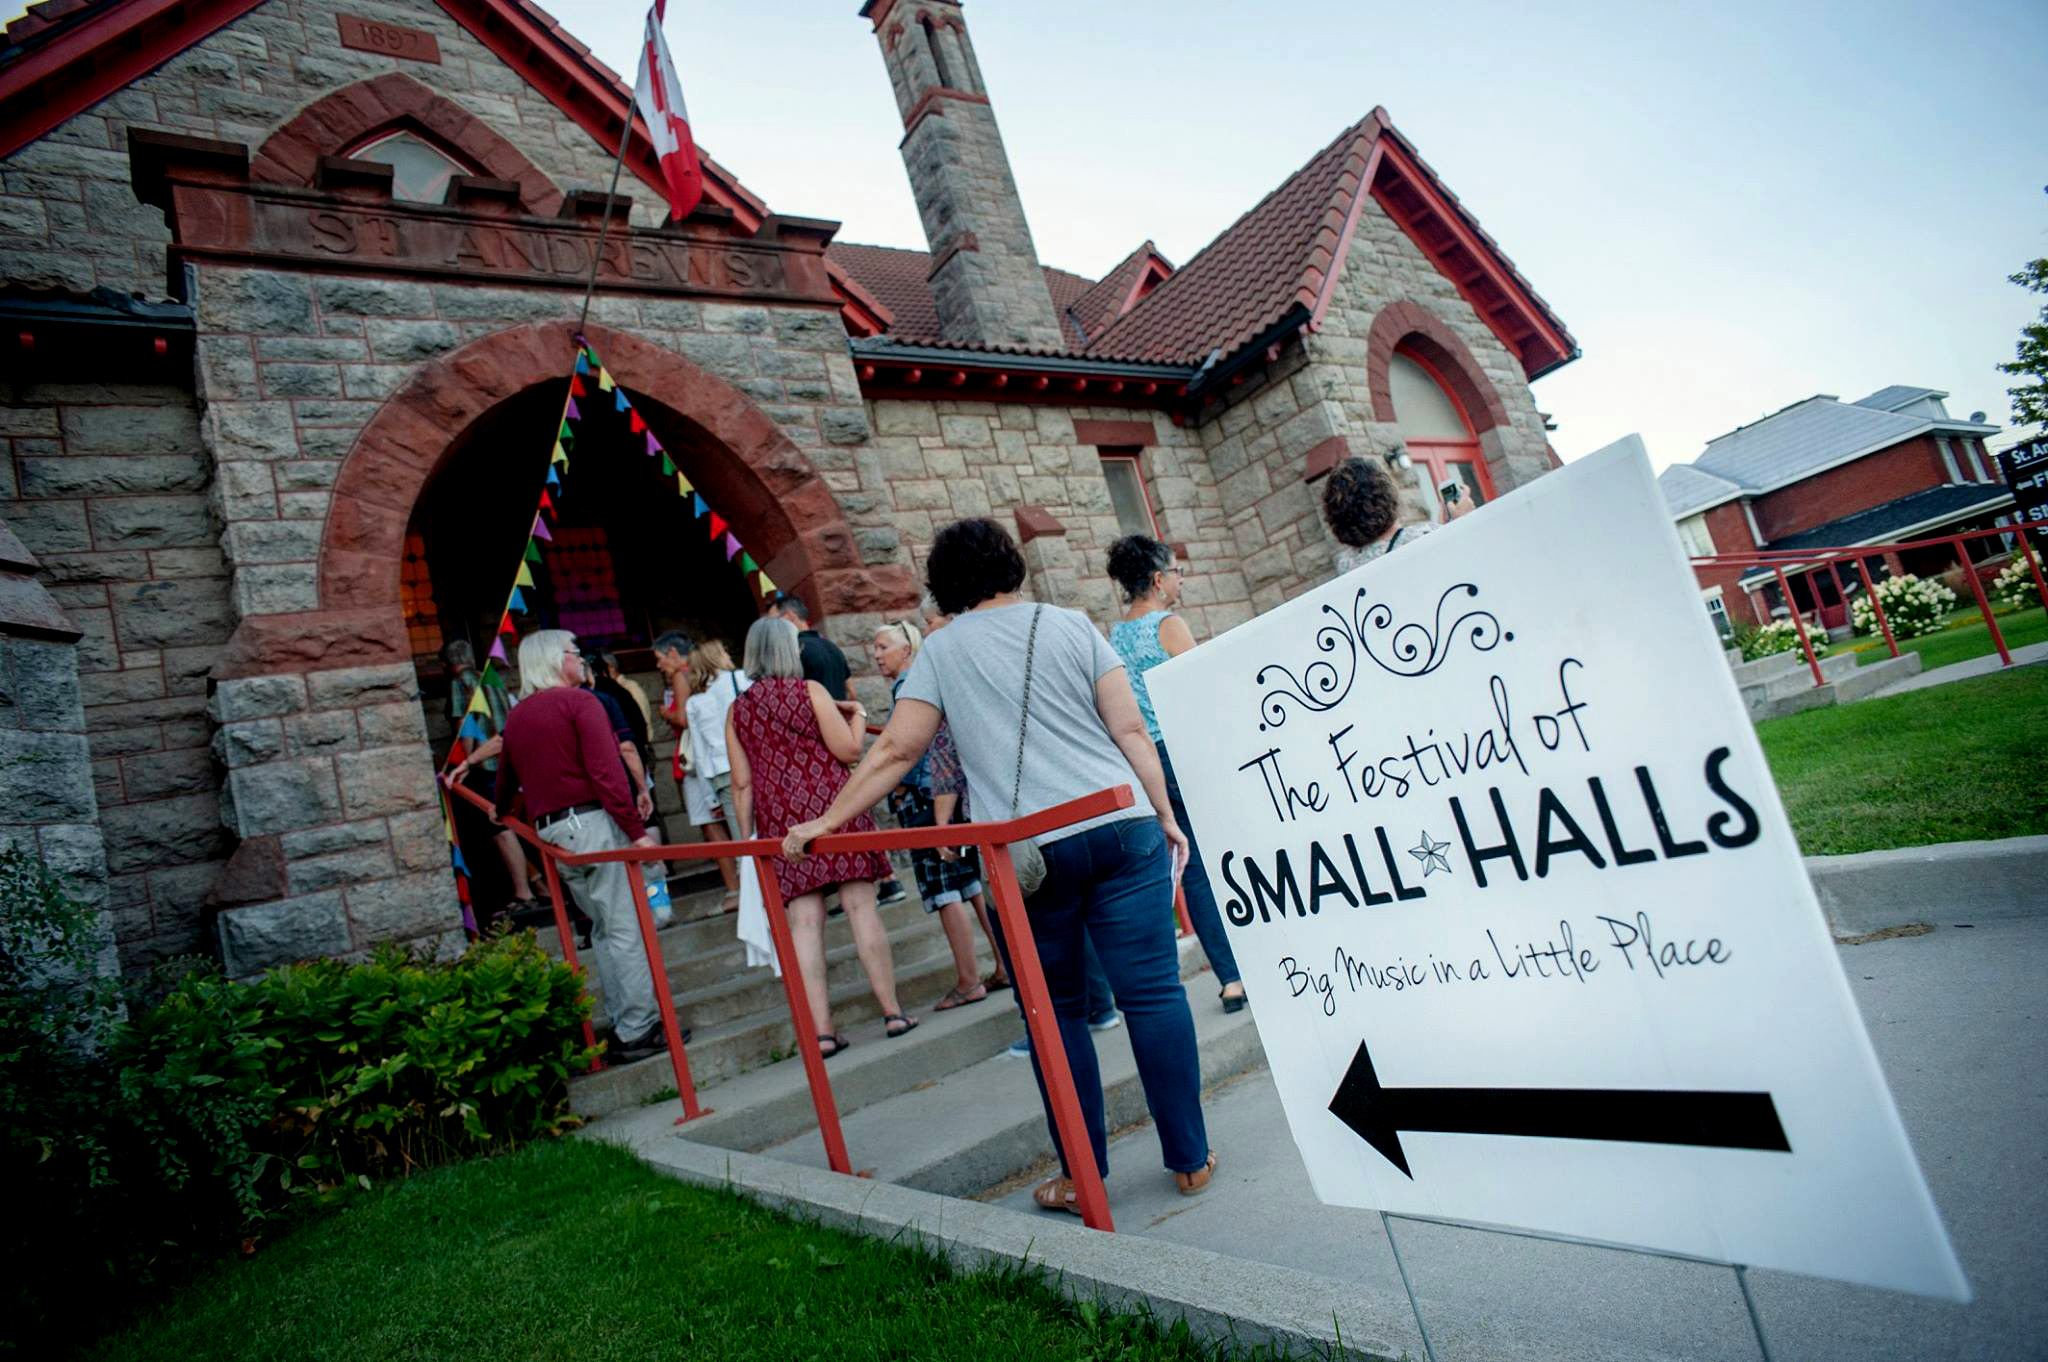 Photo: Festival of Small Halls